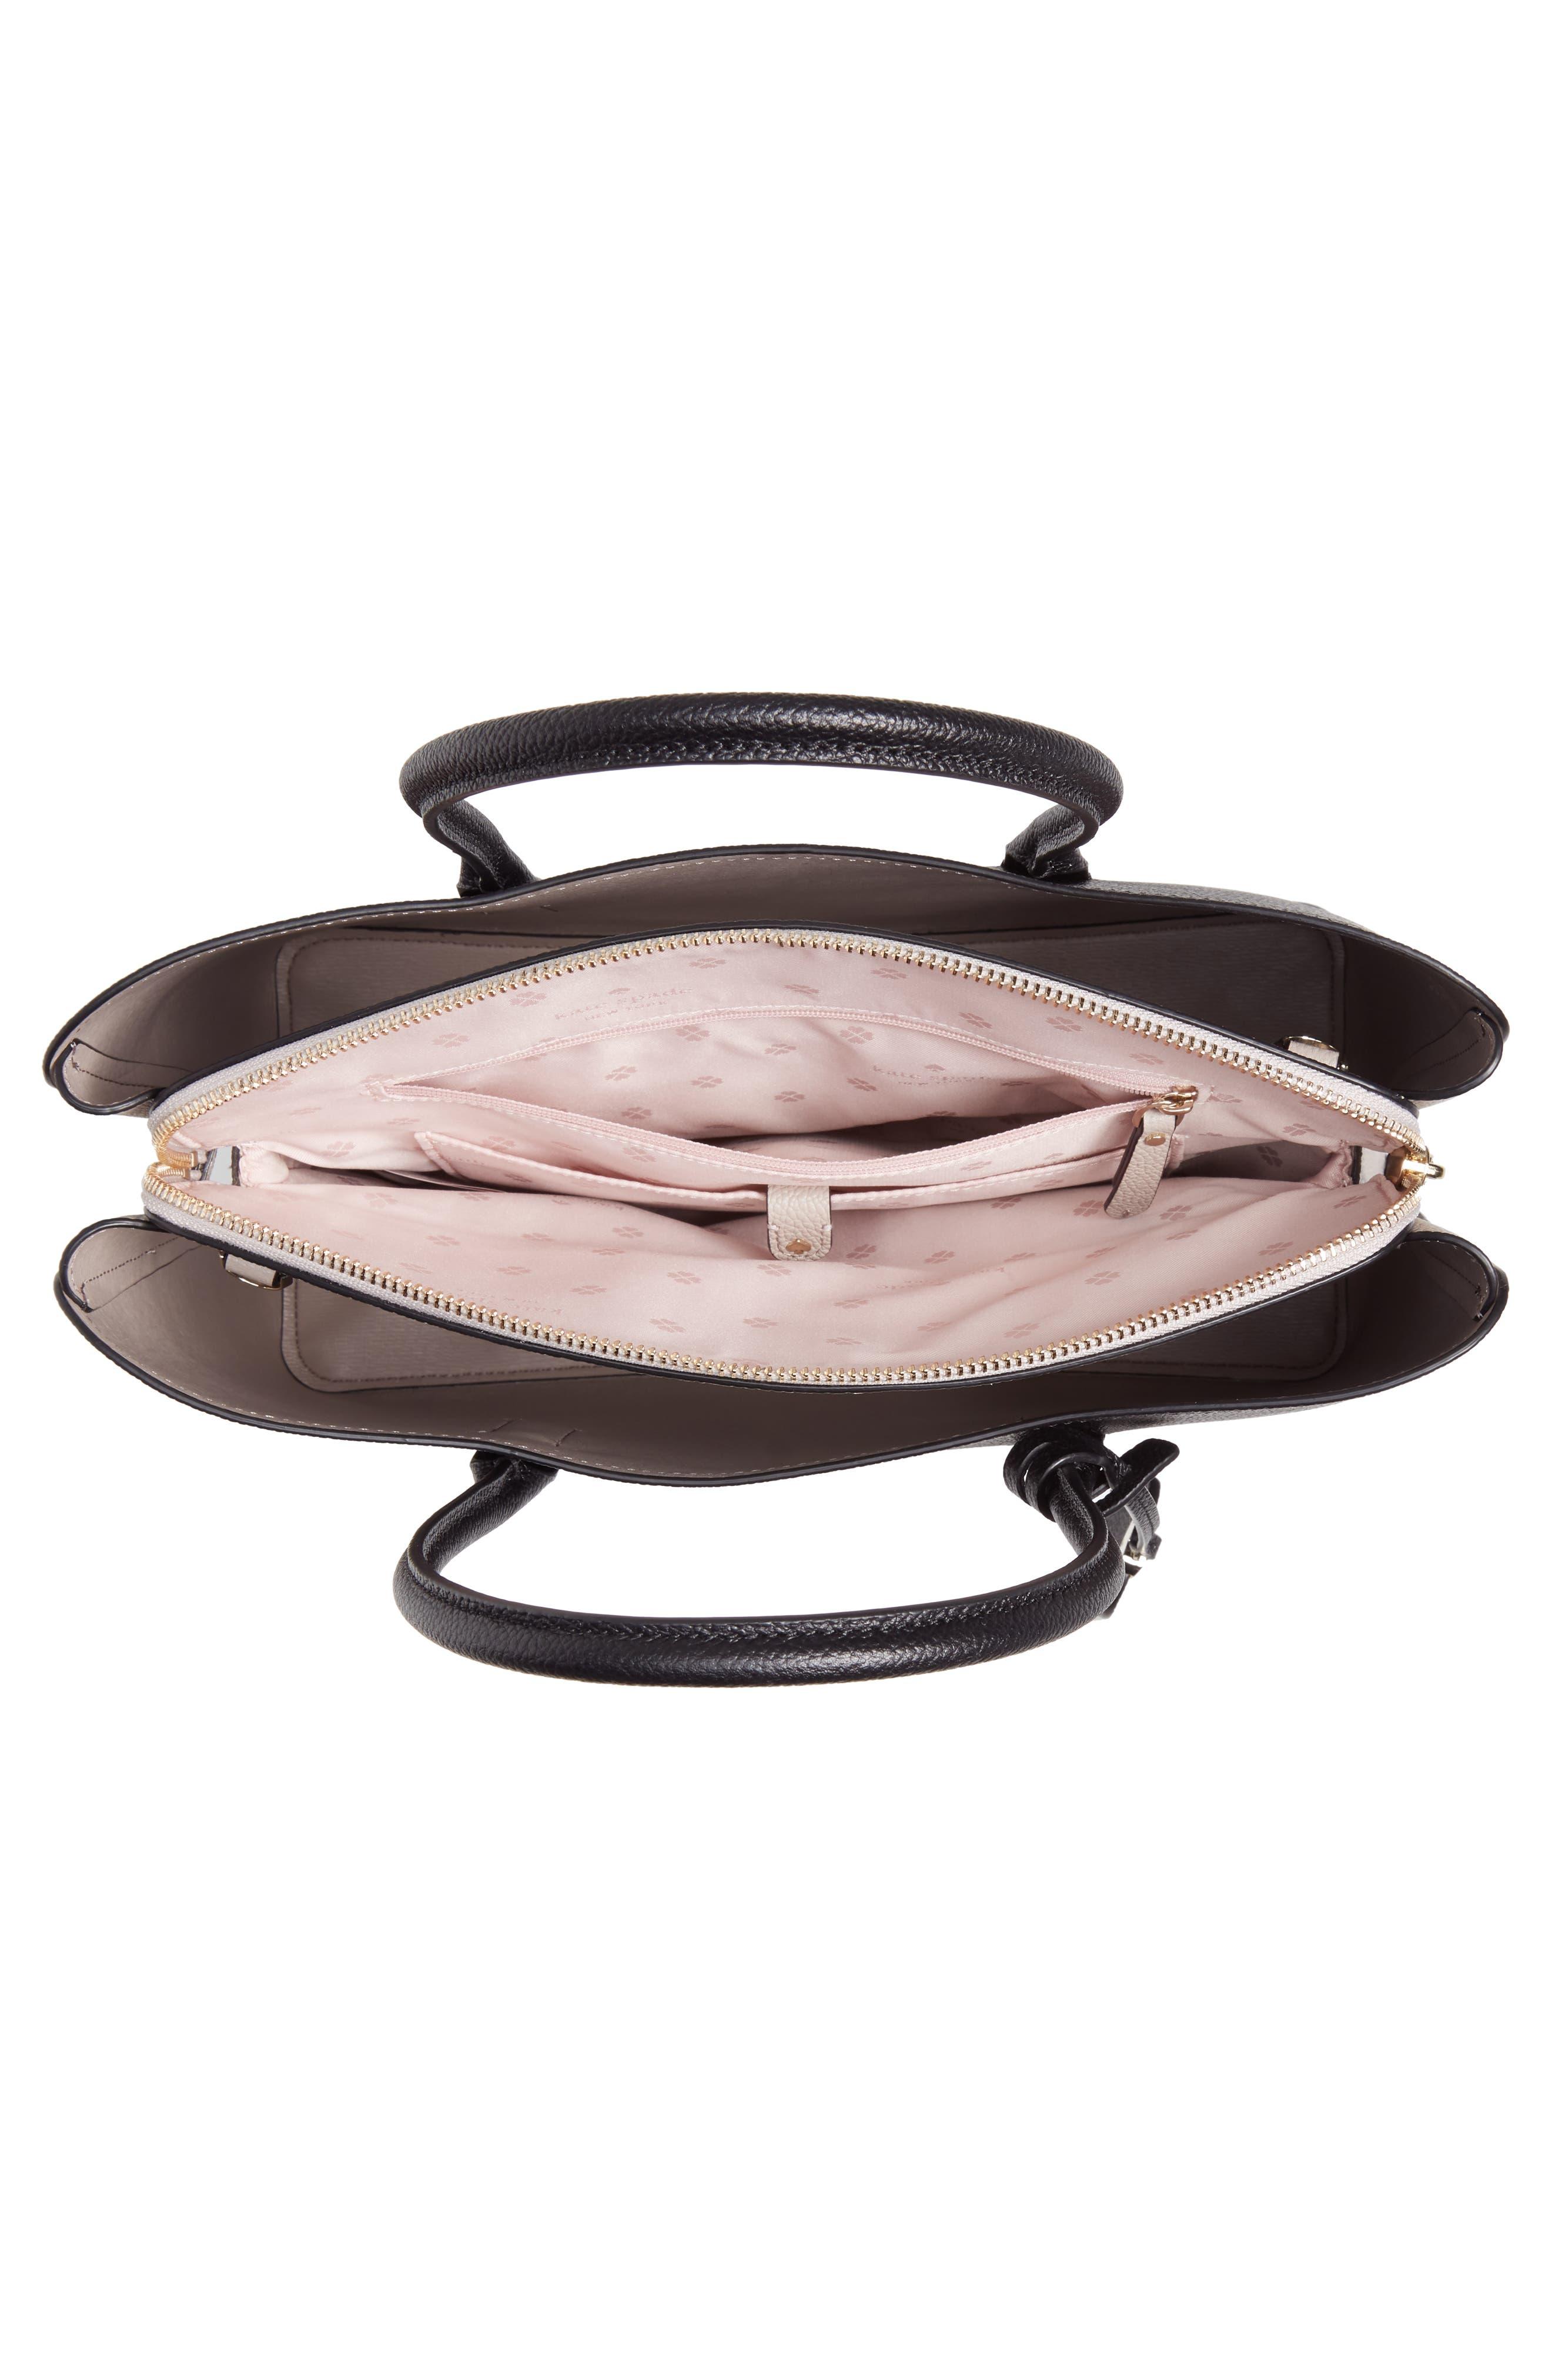 KATE SPADE NEW YORK, large margaux leather satchel, Alternate thumbnail 5, color, BLACK/ WARM TAUPE